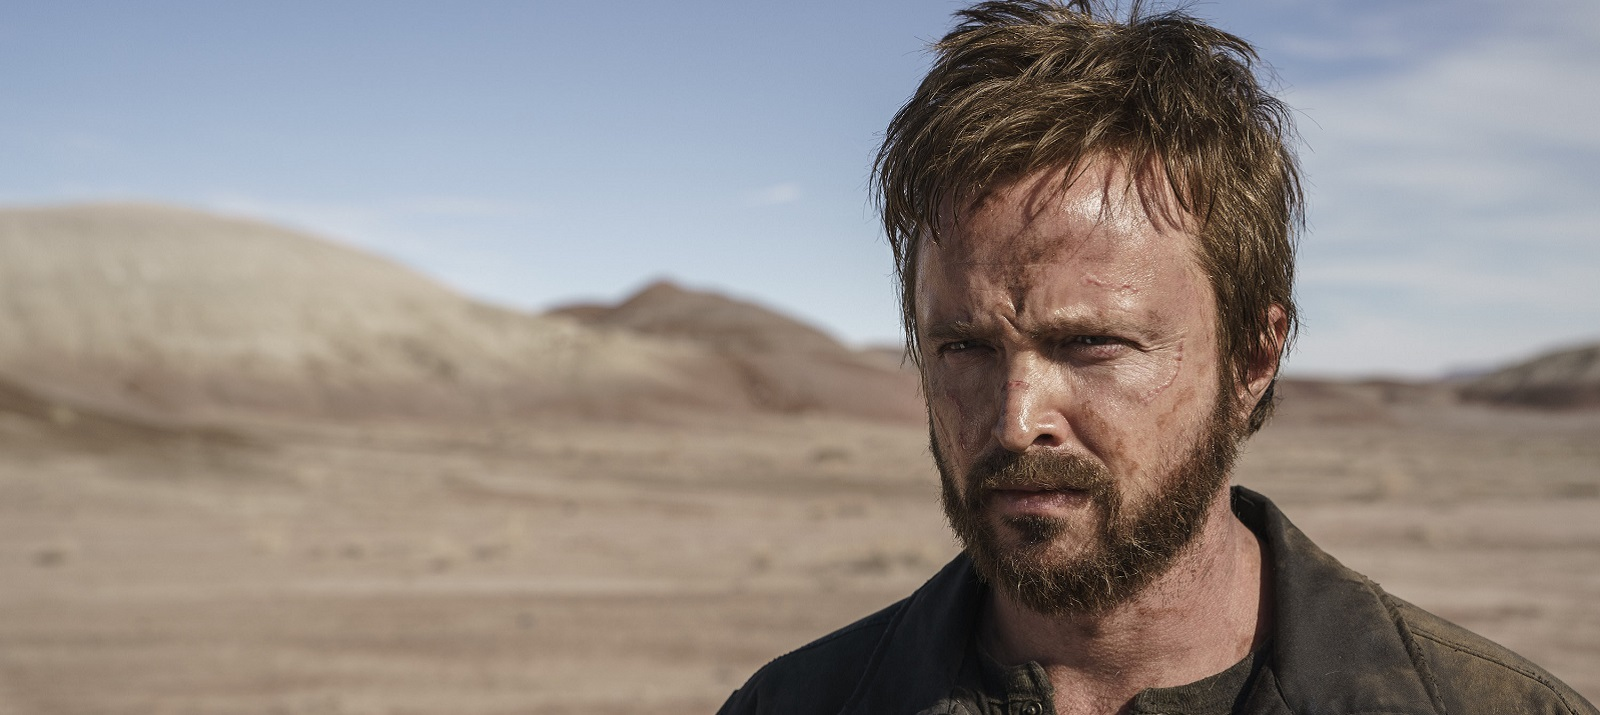 Долгая дорога позади: Рецензия на фильм El Camino: A Breaking Bad Movie